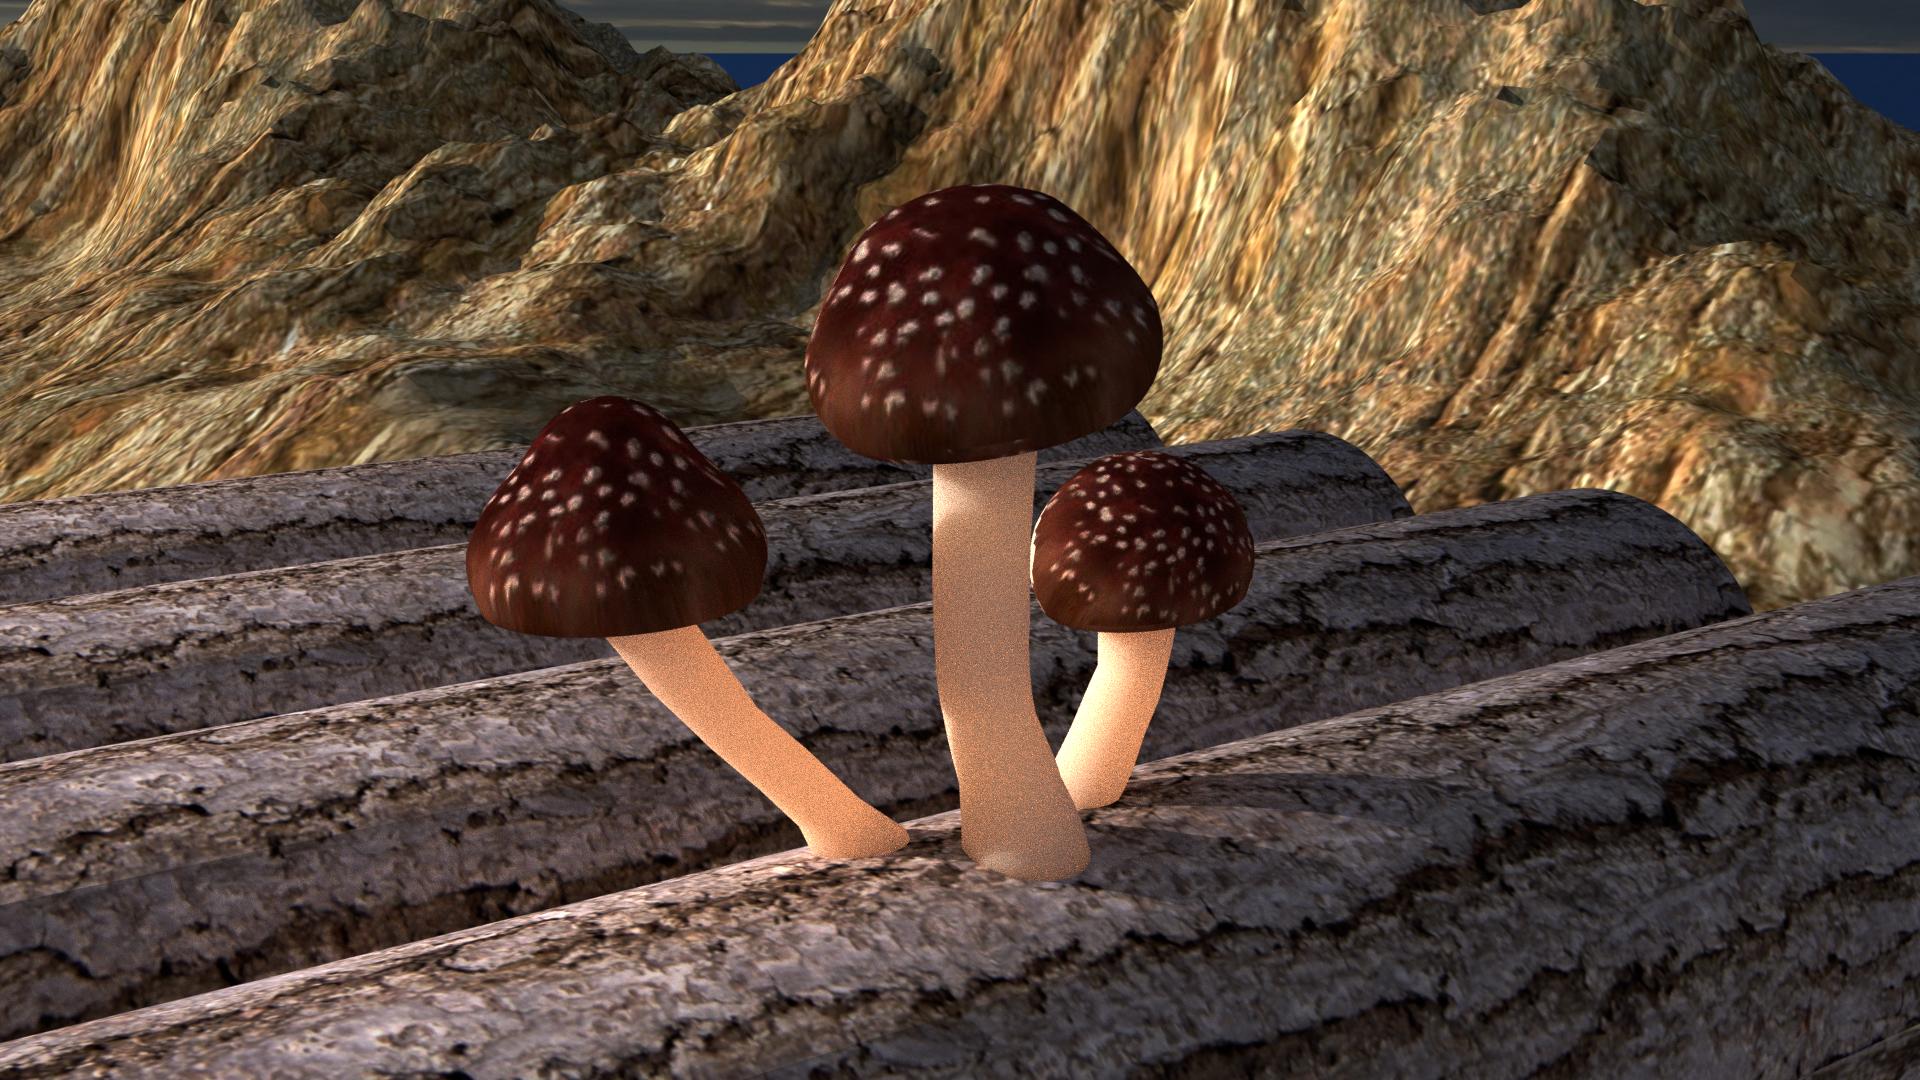 CHAMPIGNON TEST.png Download free STL file Mushroom trio • 3D printer object, V-design